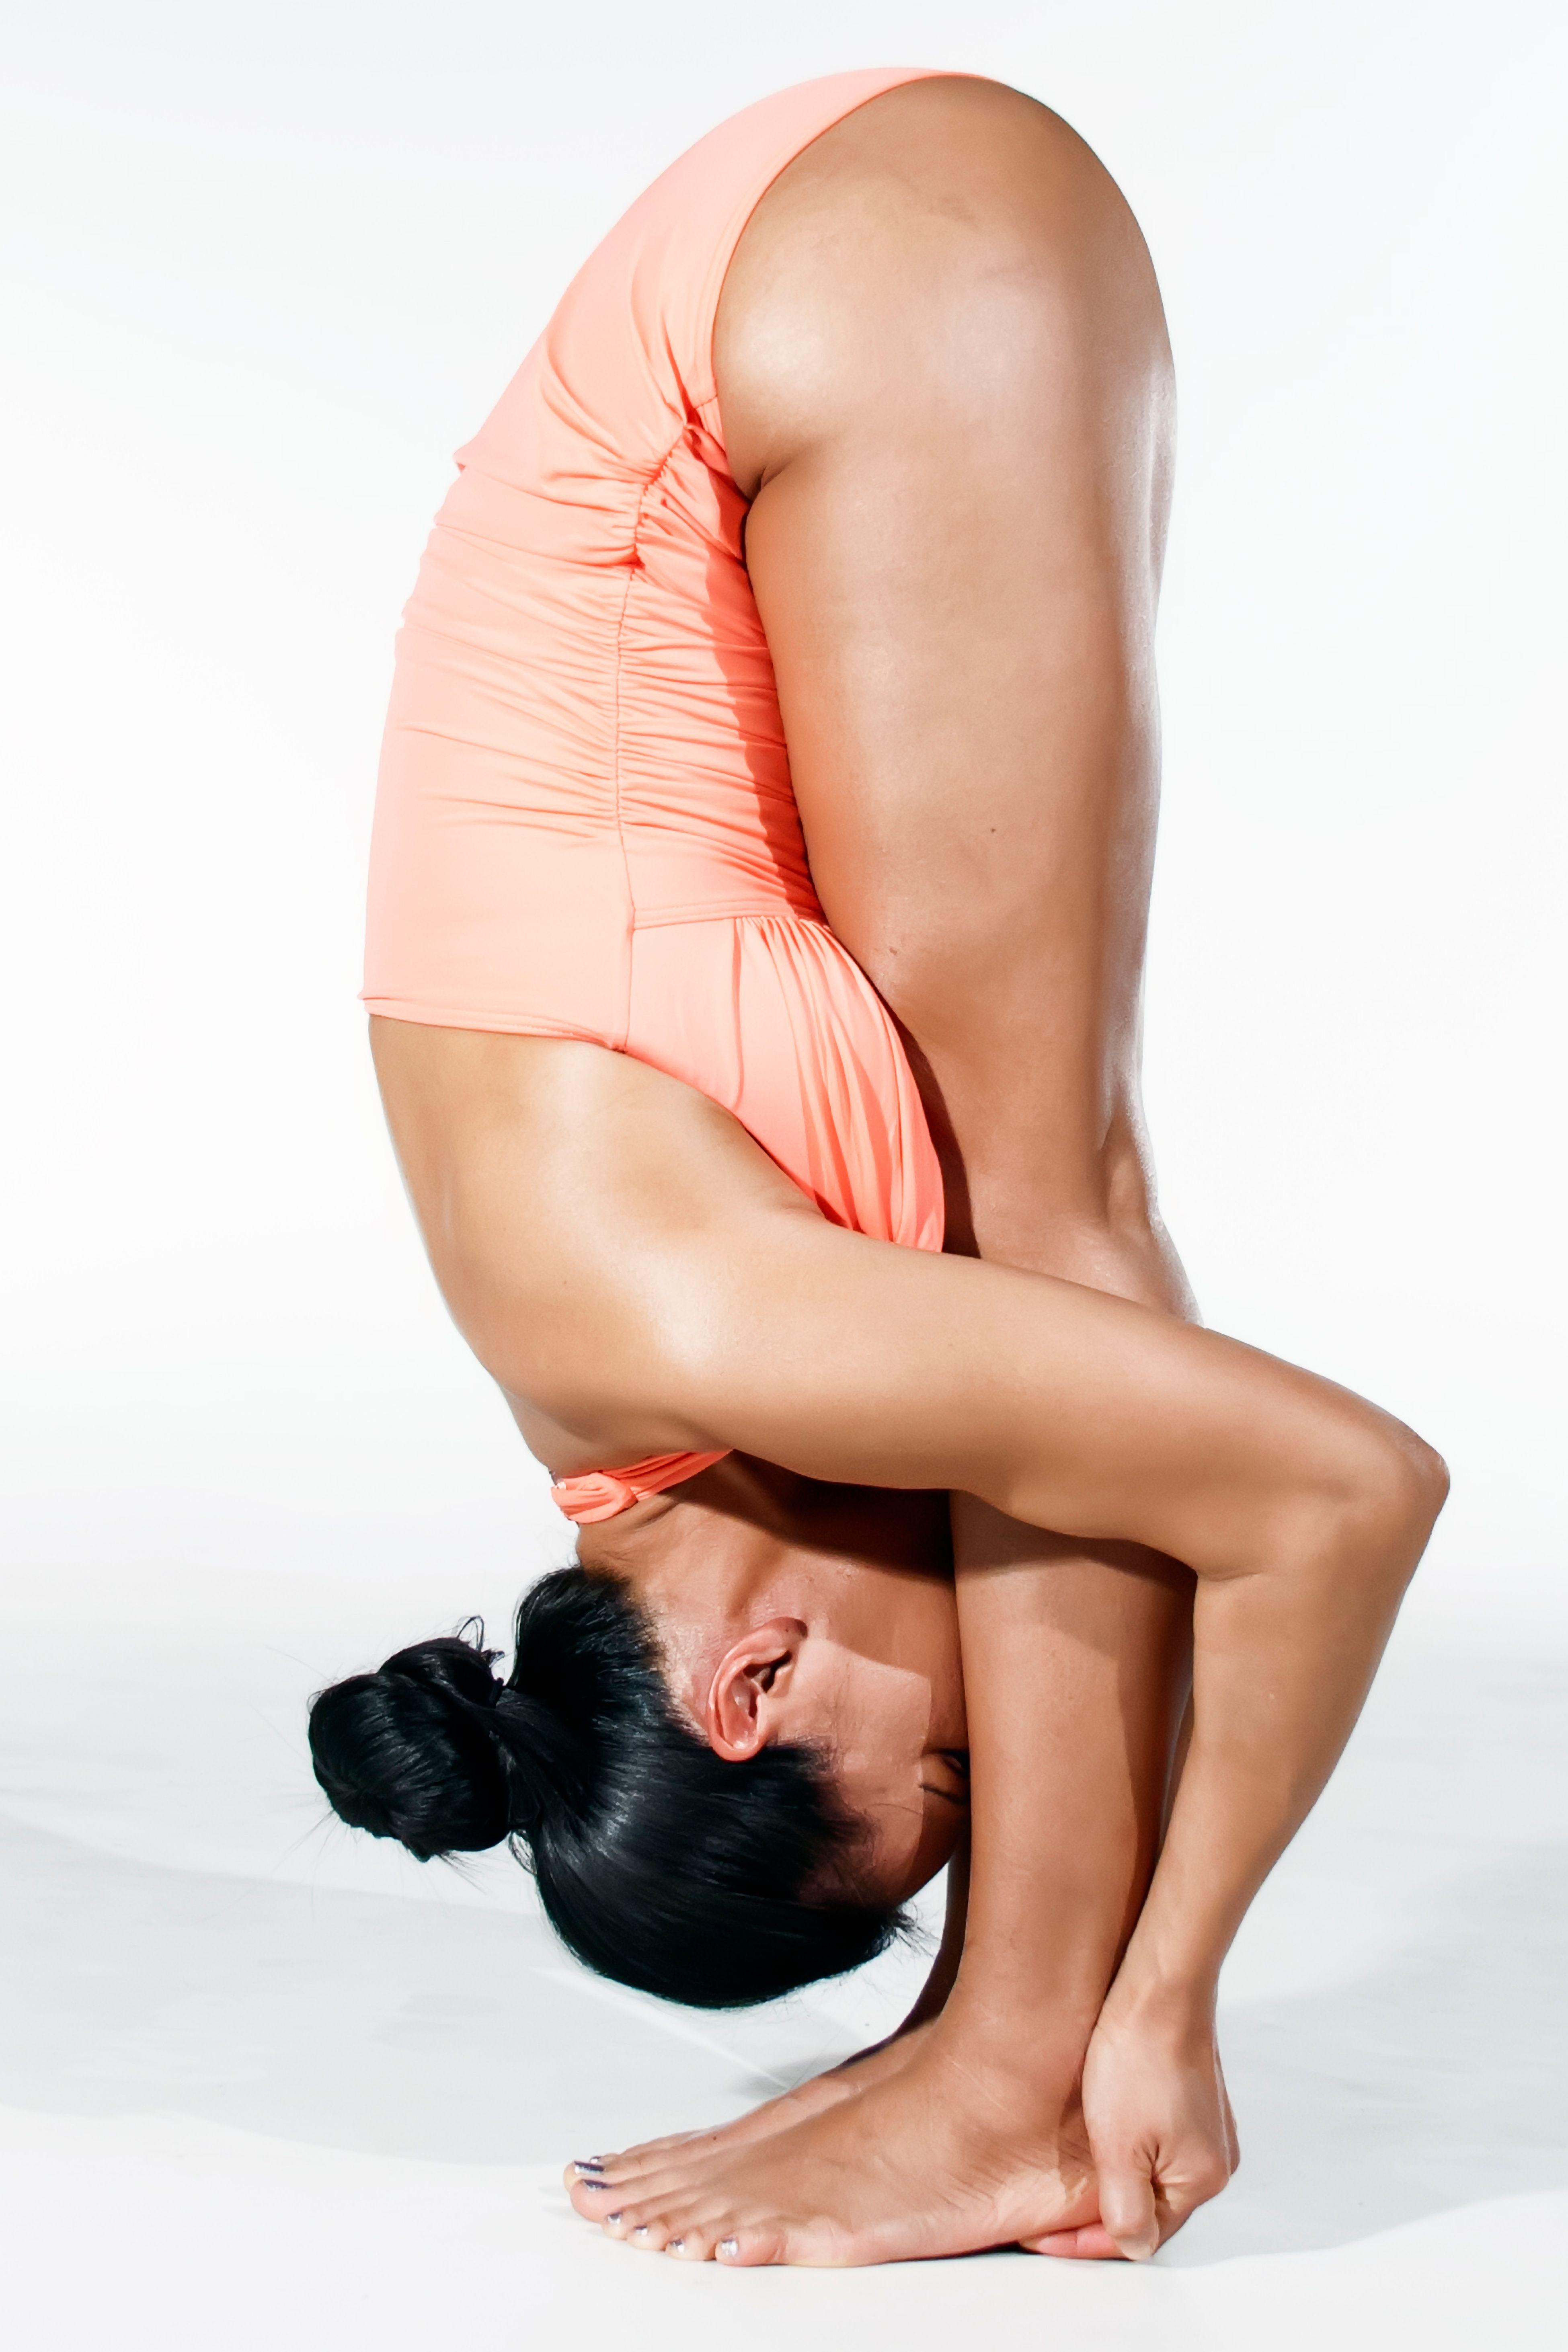 Bikram Yoga Mile High Denver Hot Yoga Hot Yoga Bikram Yoga Yoga